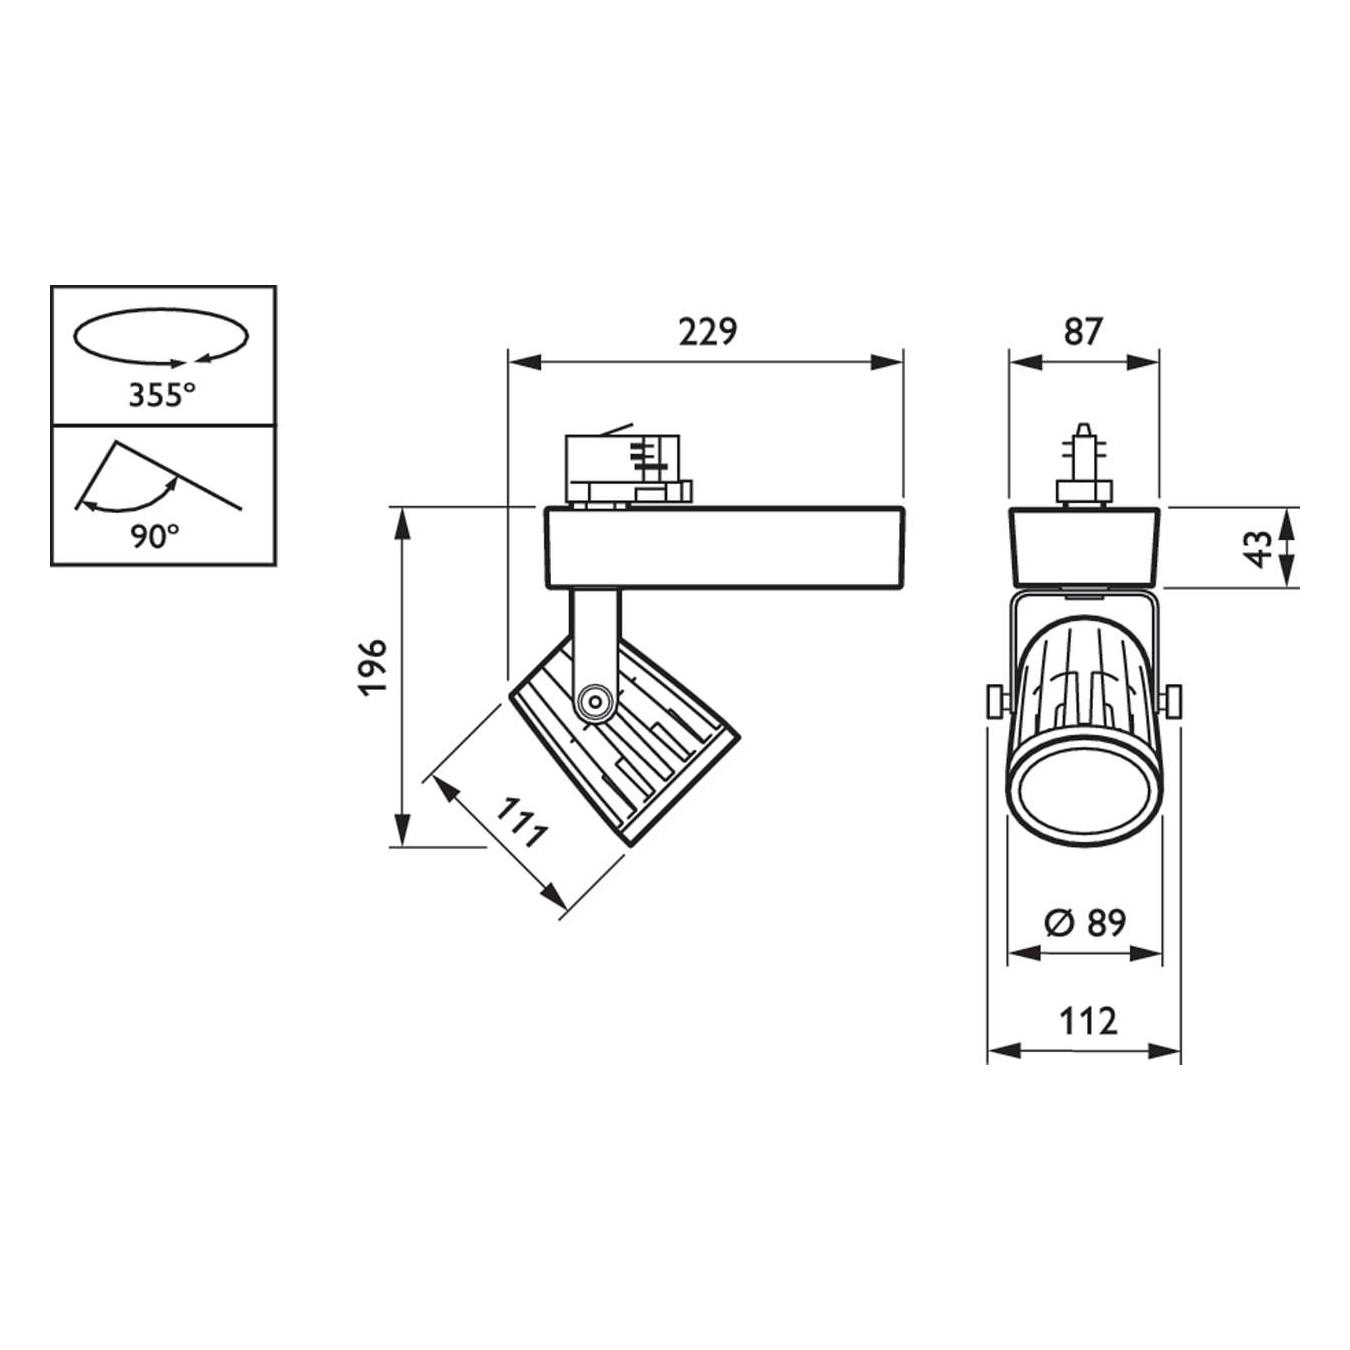 diagram of interior of 2002 dodge caravan philips ecostyle black led projector 27w 4000k 33 degree ...